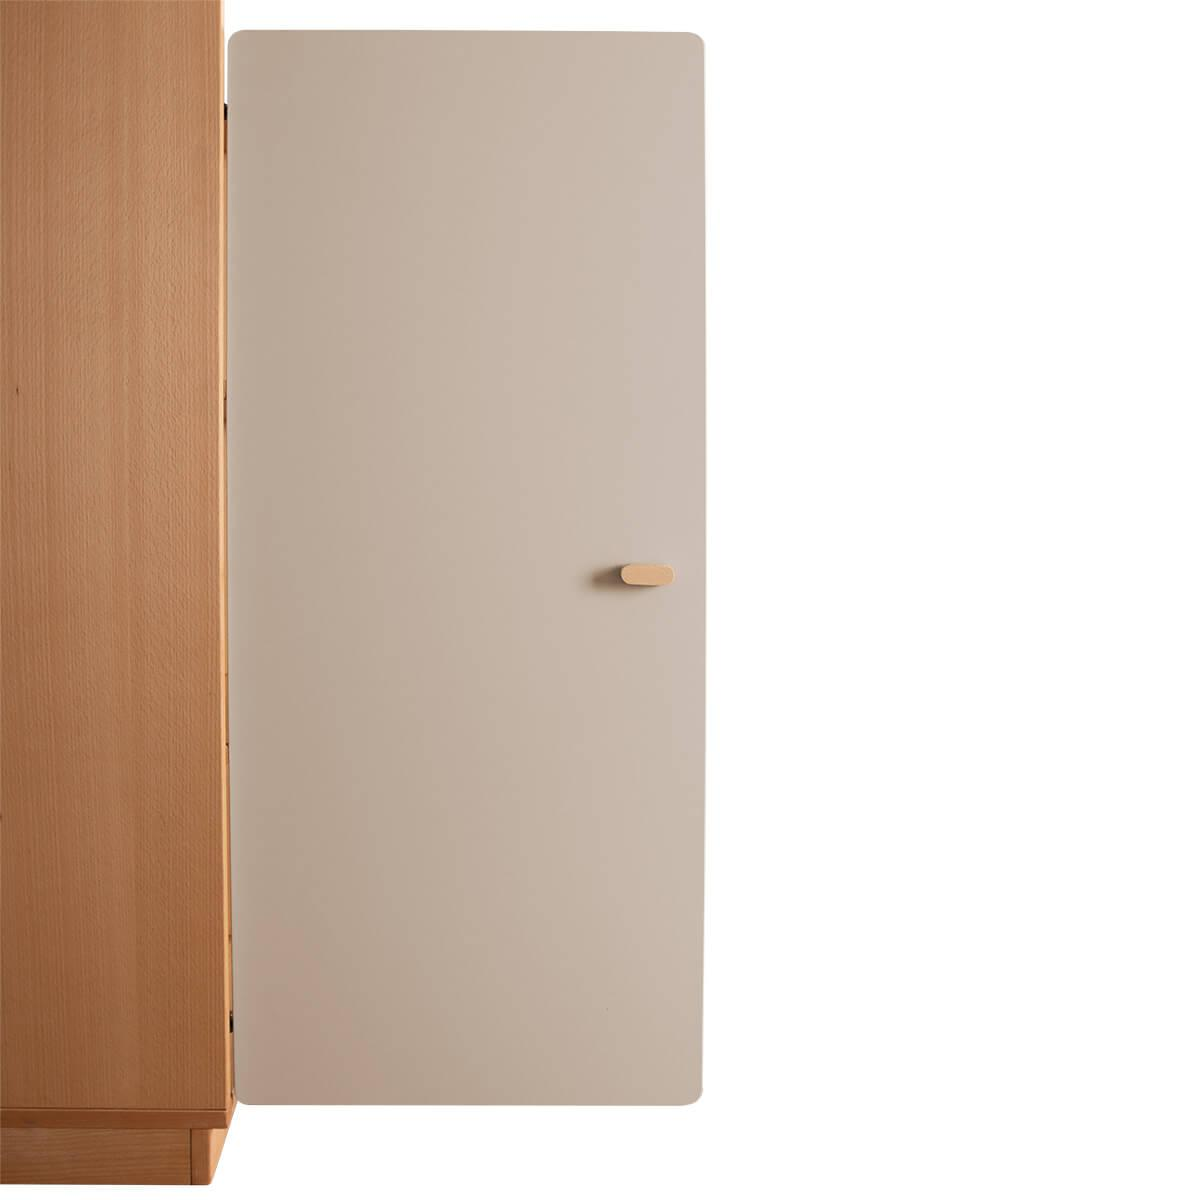 Schranktür 3/5 106cm-Griff DESTYLE Debreuyn  MDF hellgrau-lackiert